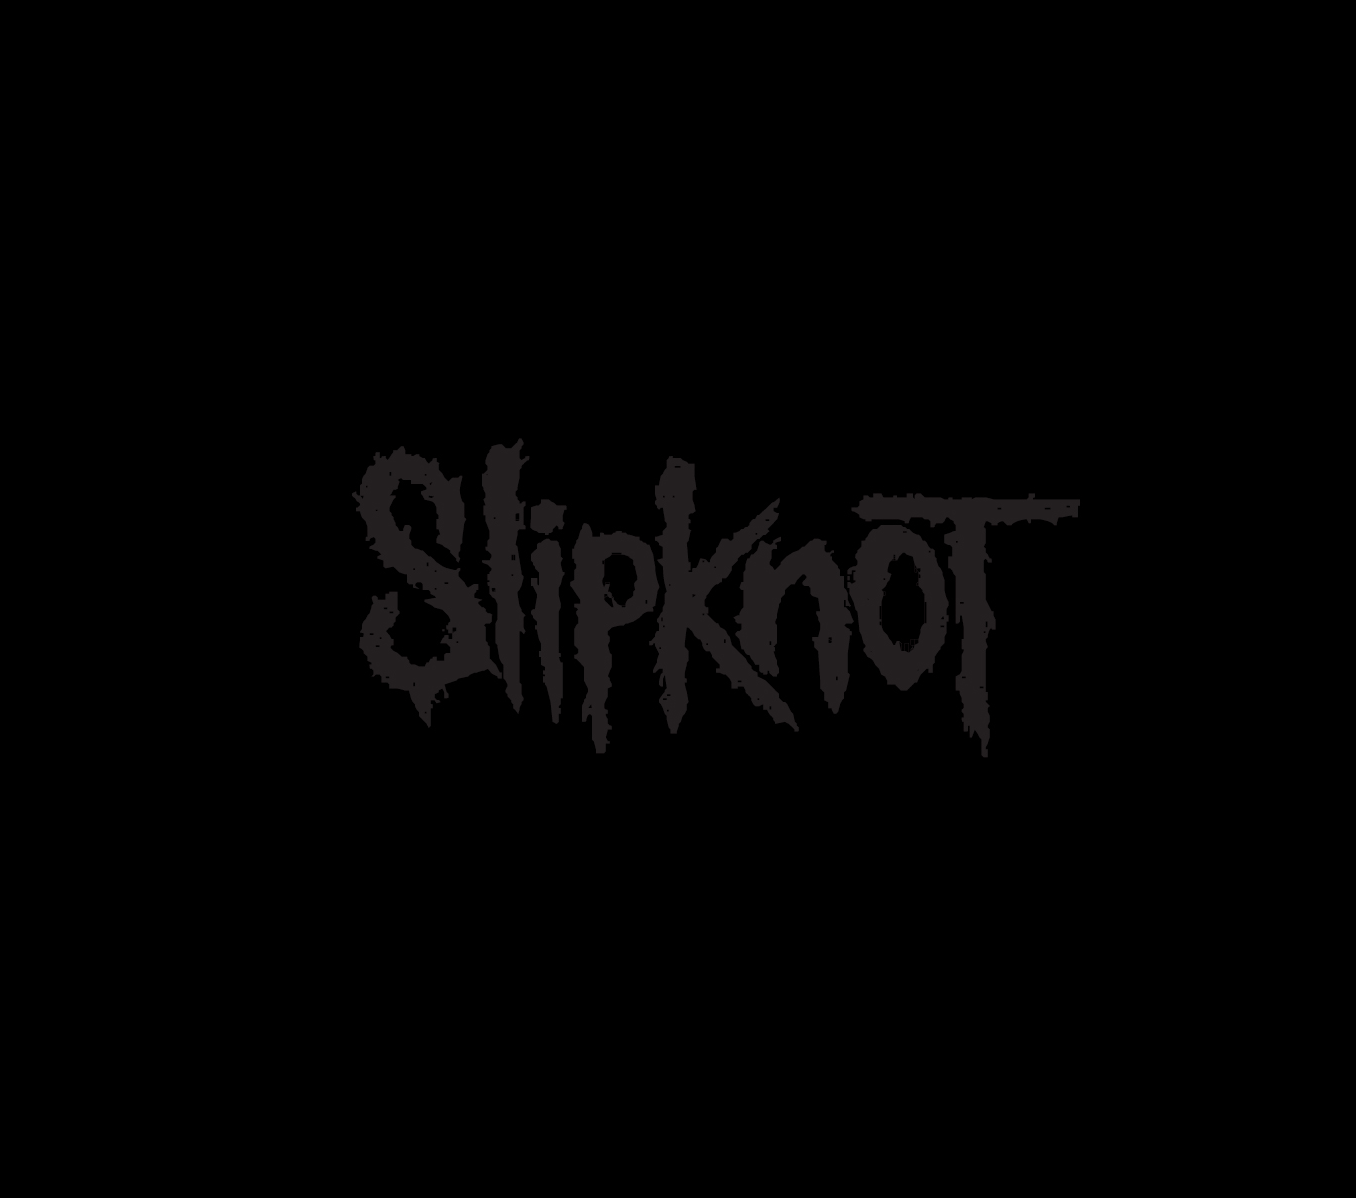 Eeyore - Slipknot (Drum Transcription) — Nick Hartland